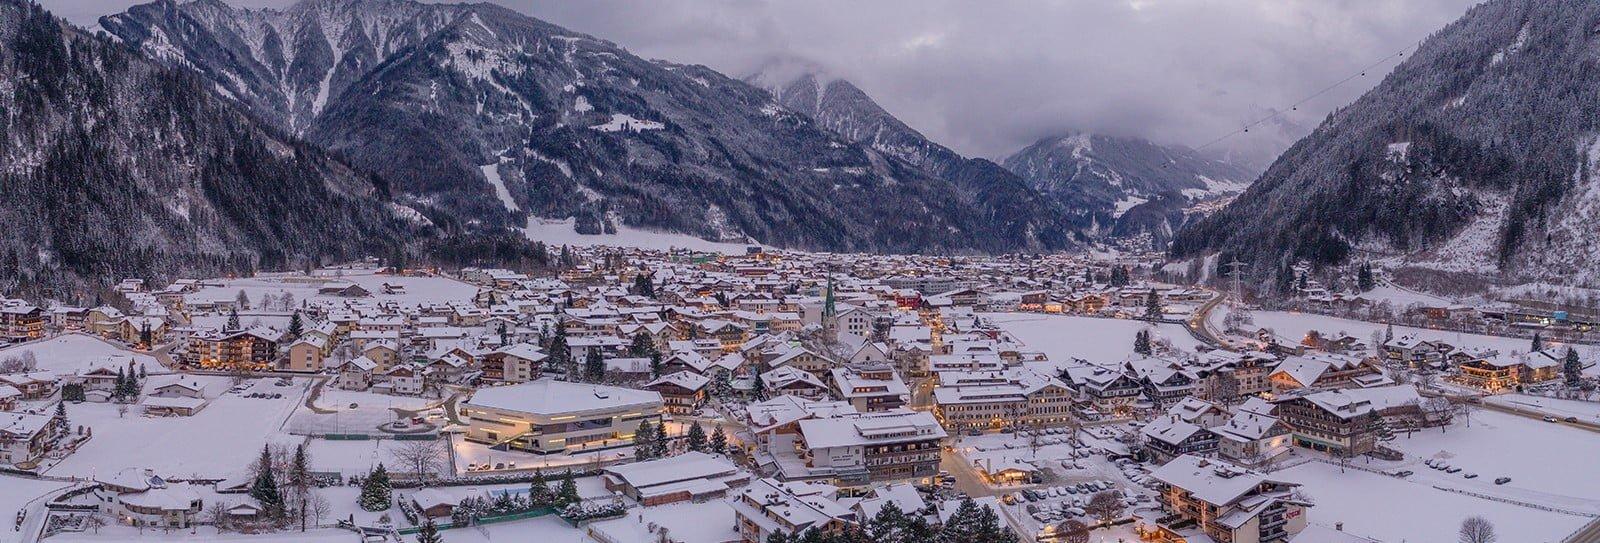 Mayrhofen panorama